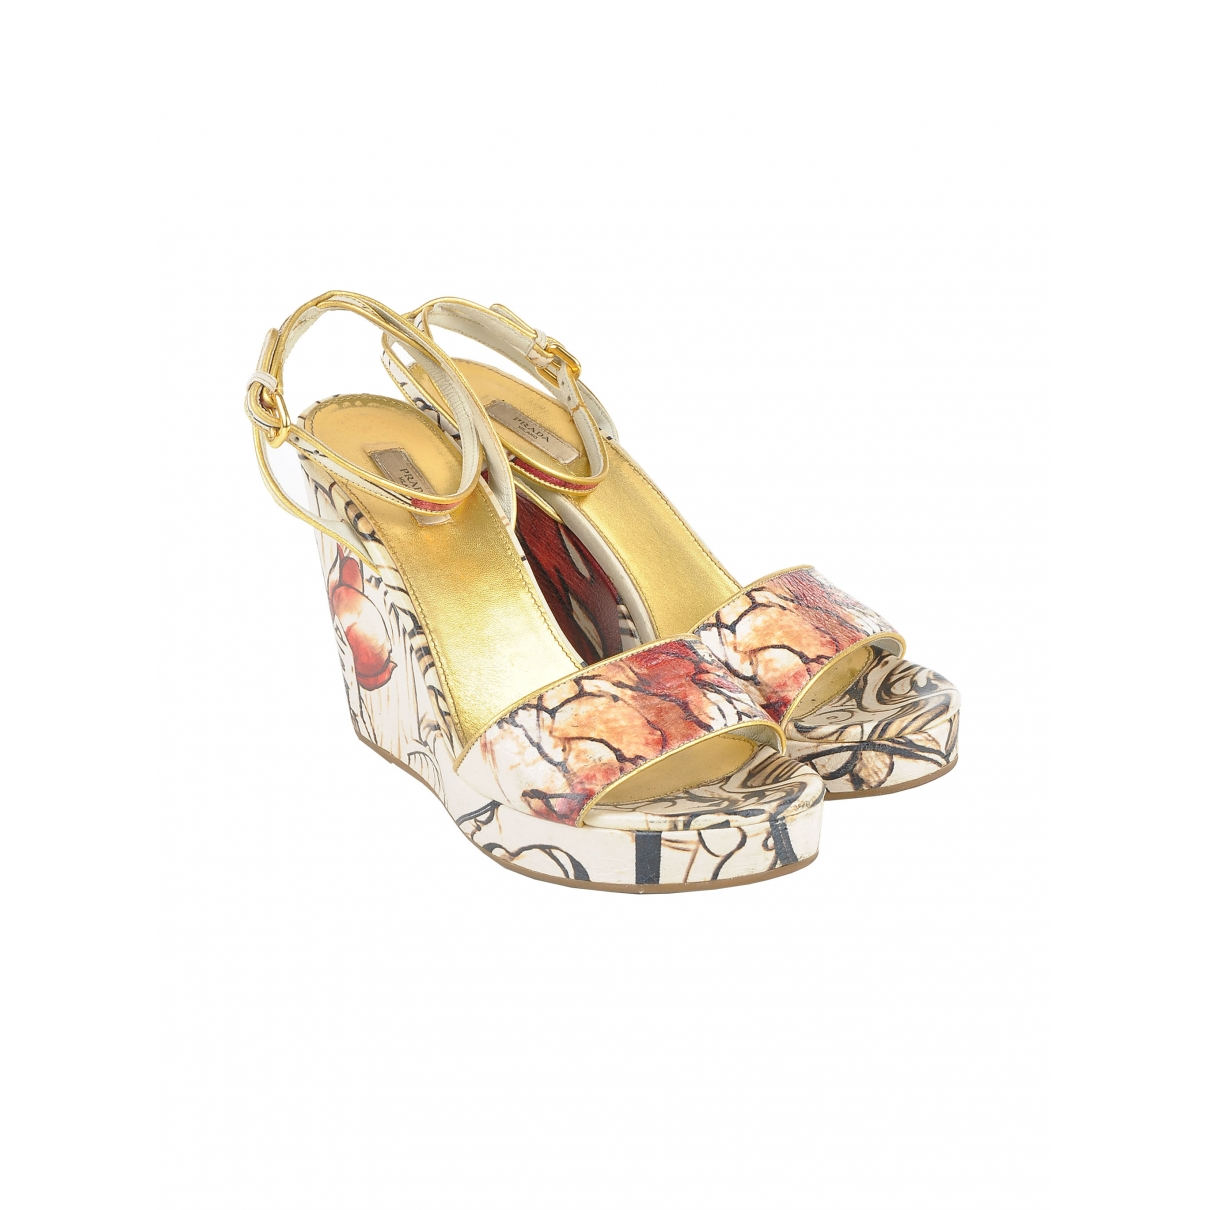 Prada \N Multicolour Leather Sandals for Women 39.5 IT